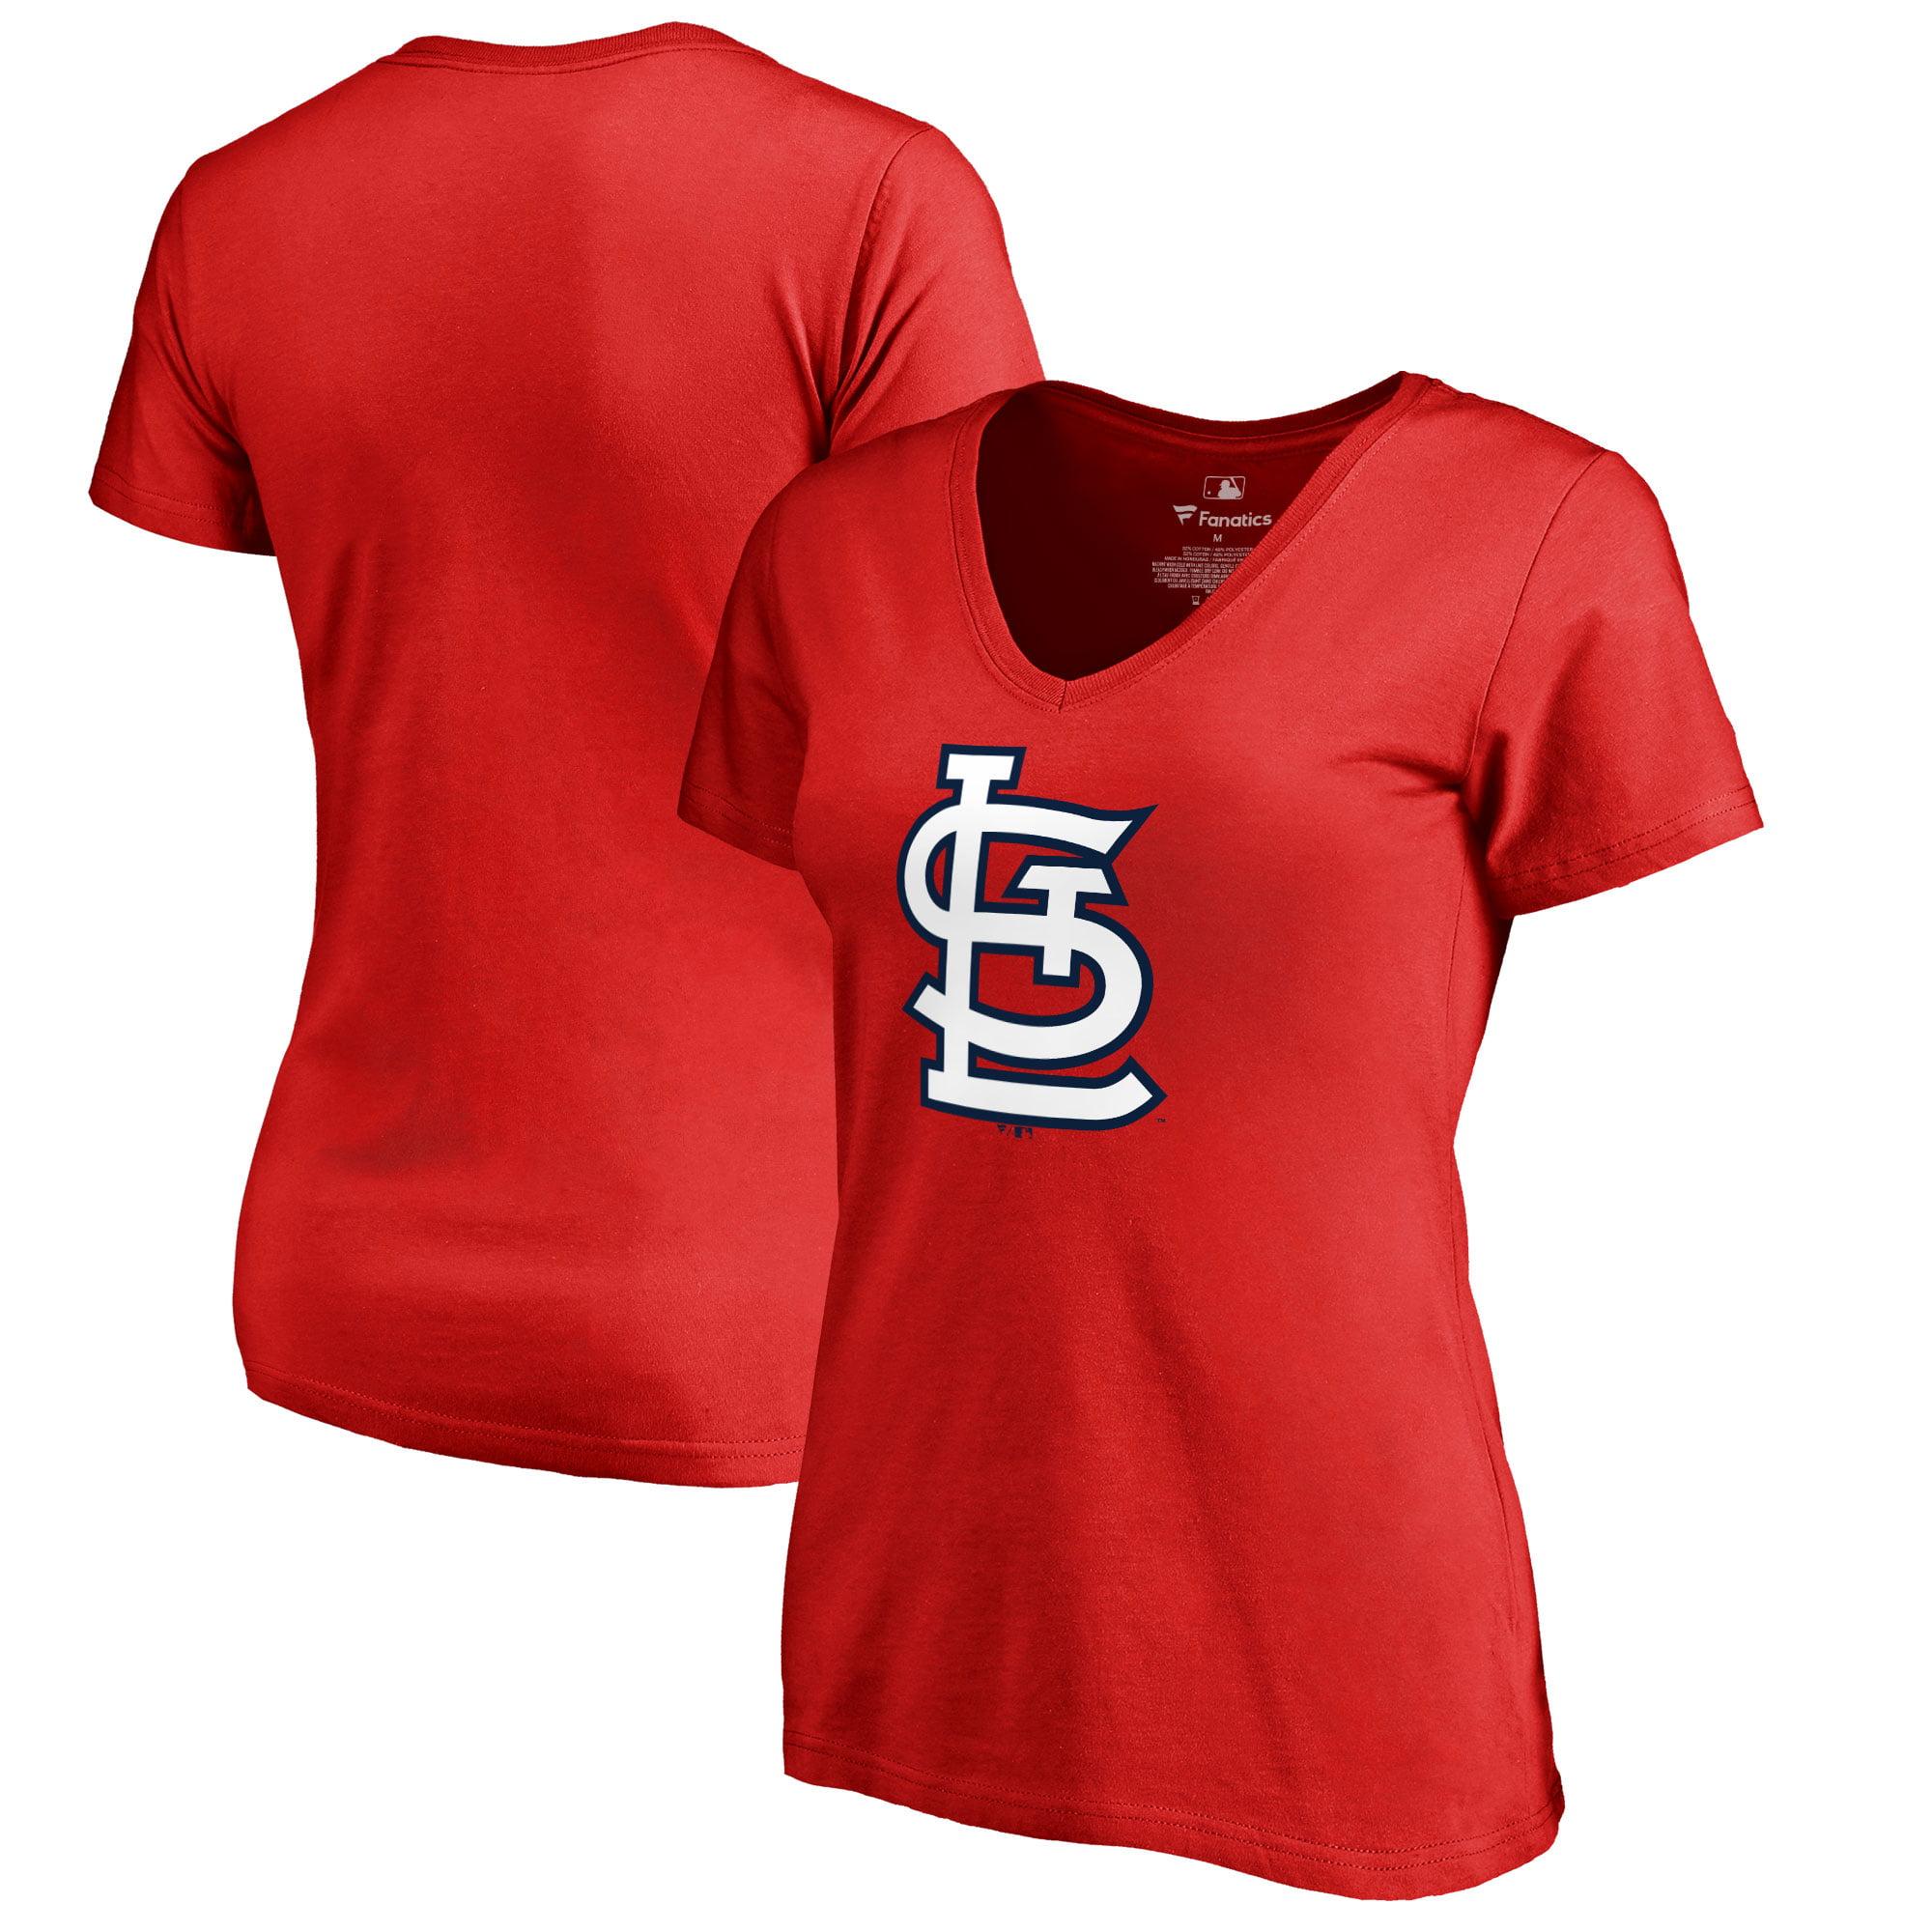 St. Louis Cardinals Women's Plus Sizes Primary Team Logo T-Shirt - Red